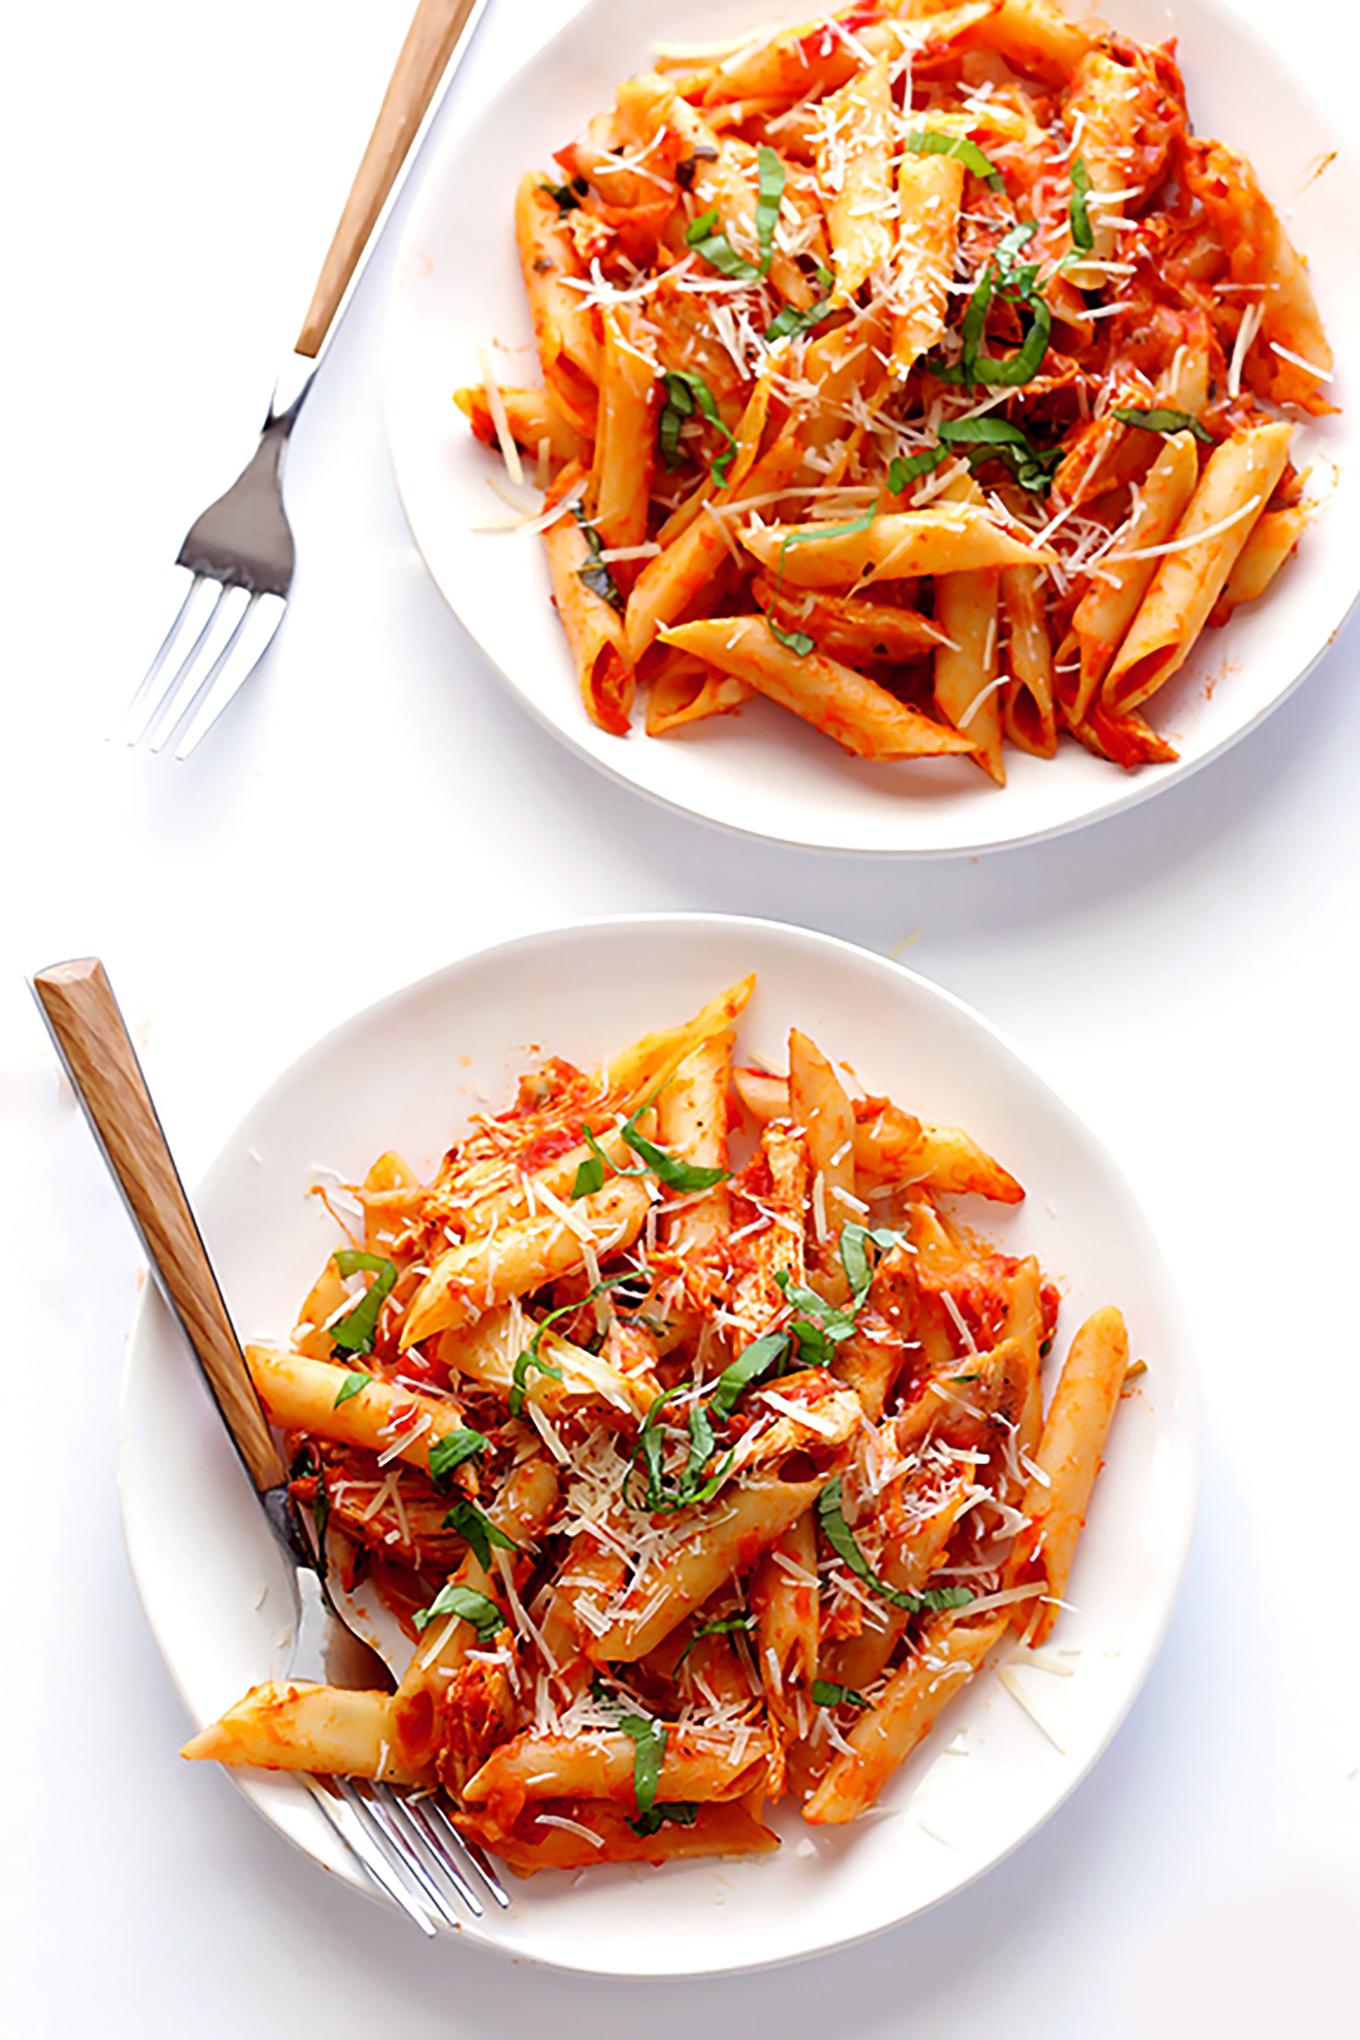 Chicken-Parmesan-Baked-Ziti-8